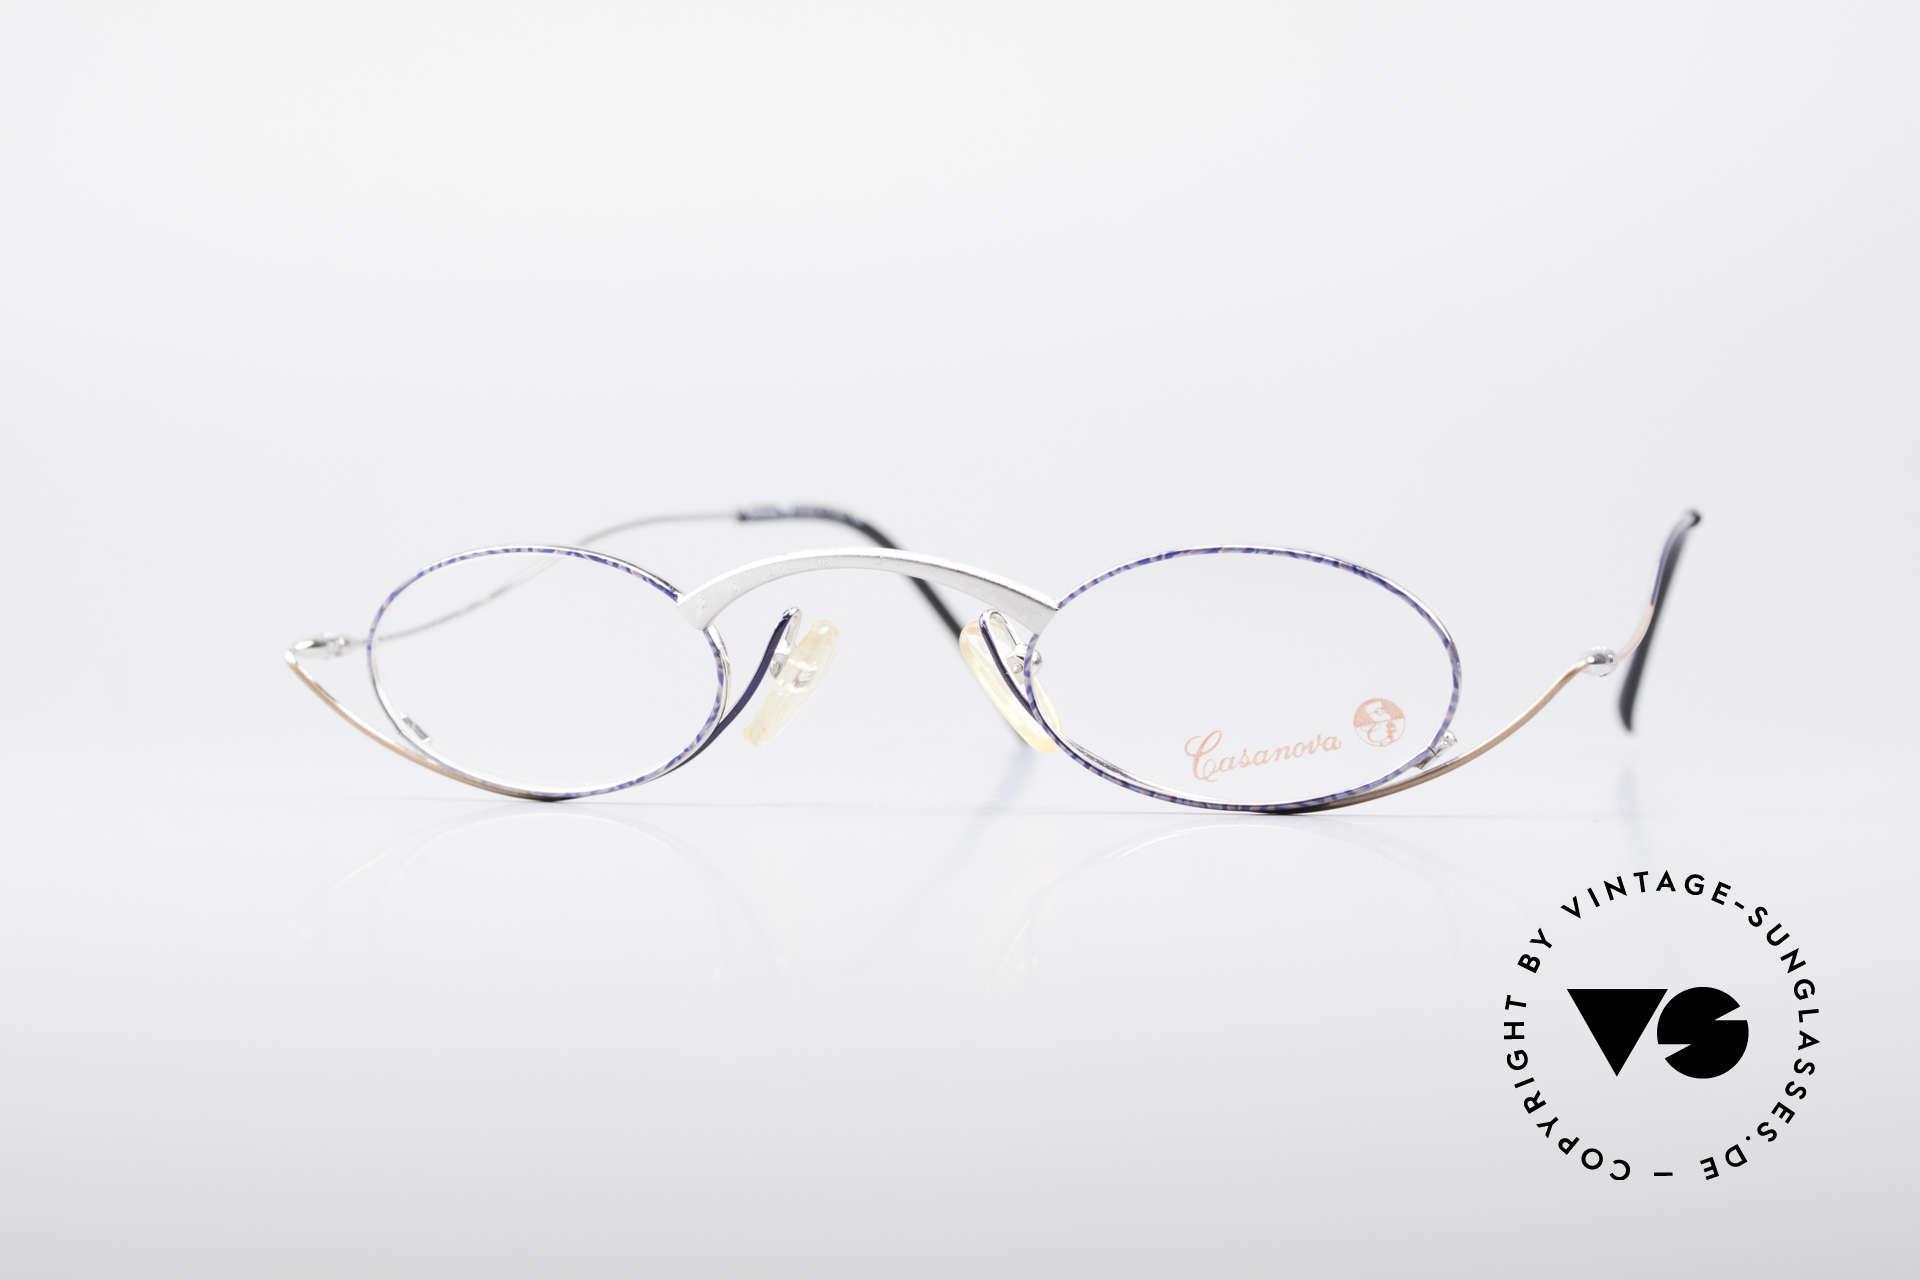 Casanova LC44 Artistic Reading Glasses, extraordinary vintage reading glasses by CASANOVA, Made for Men and Women